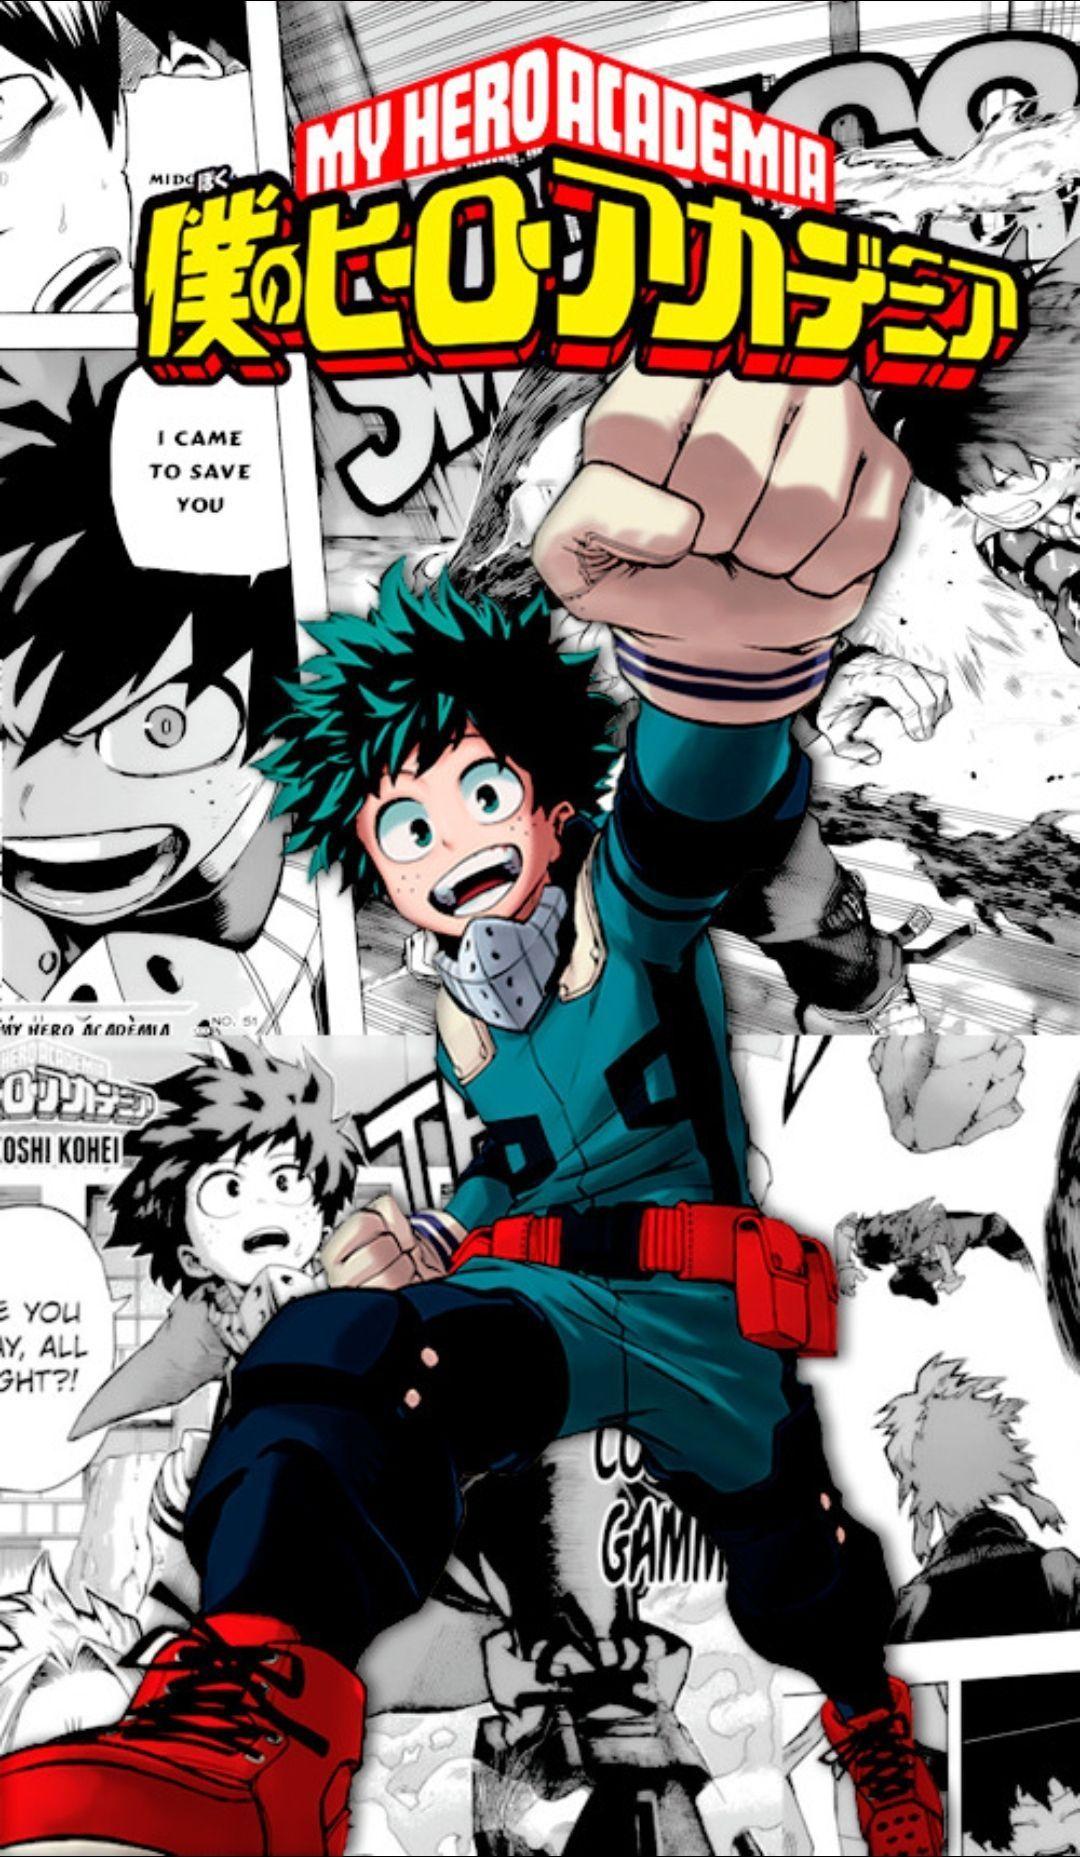 My Hero Academia Wallpapers Izuku Midoriya Part 1 Hero Poster My Hero Academia Episodes Hero